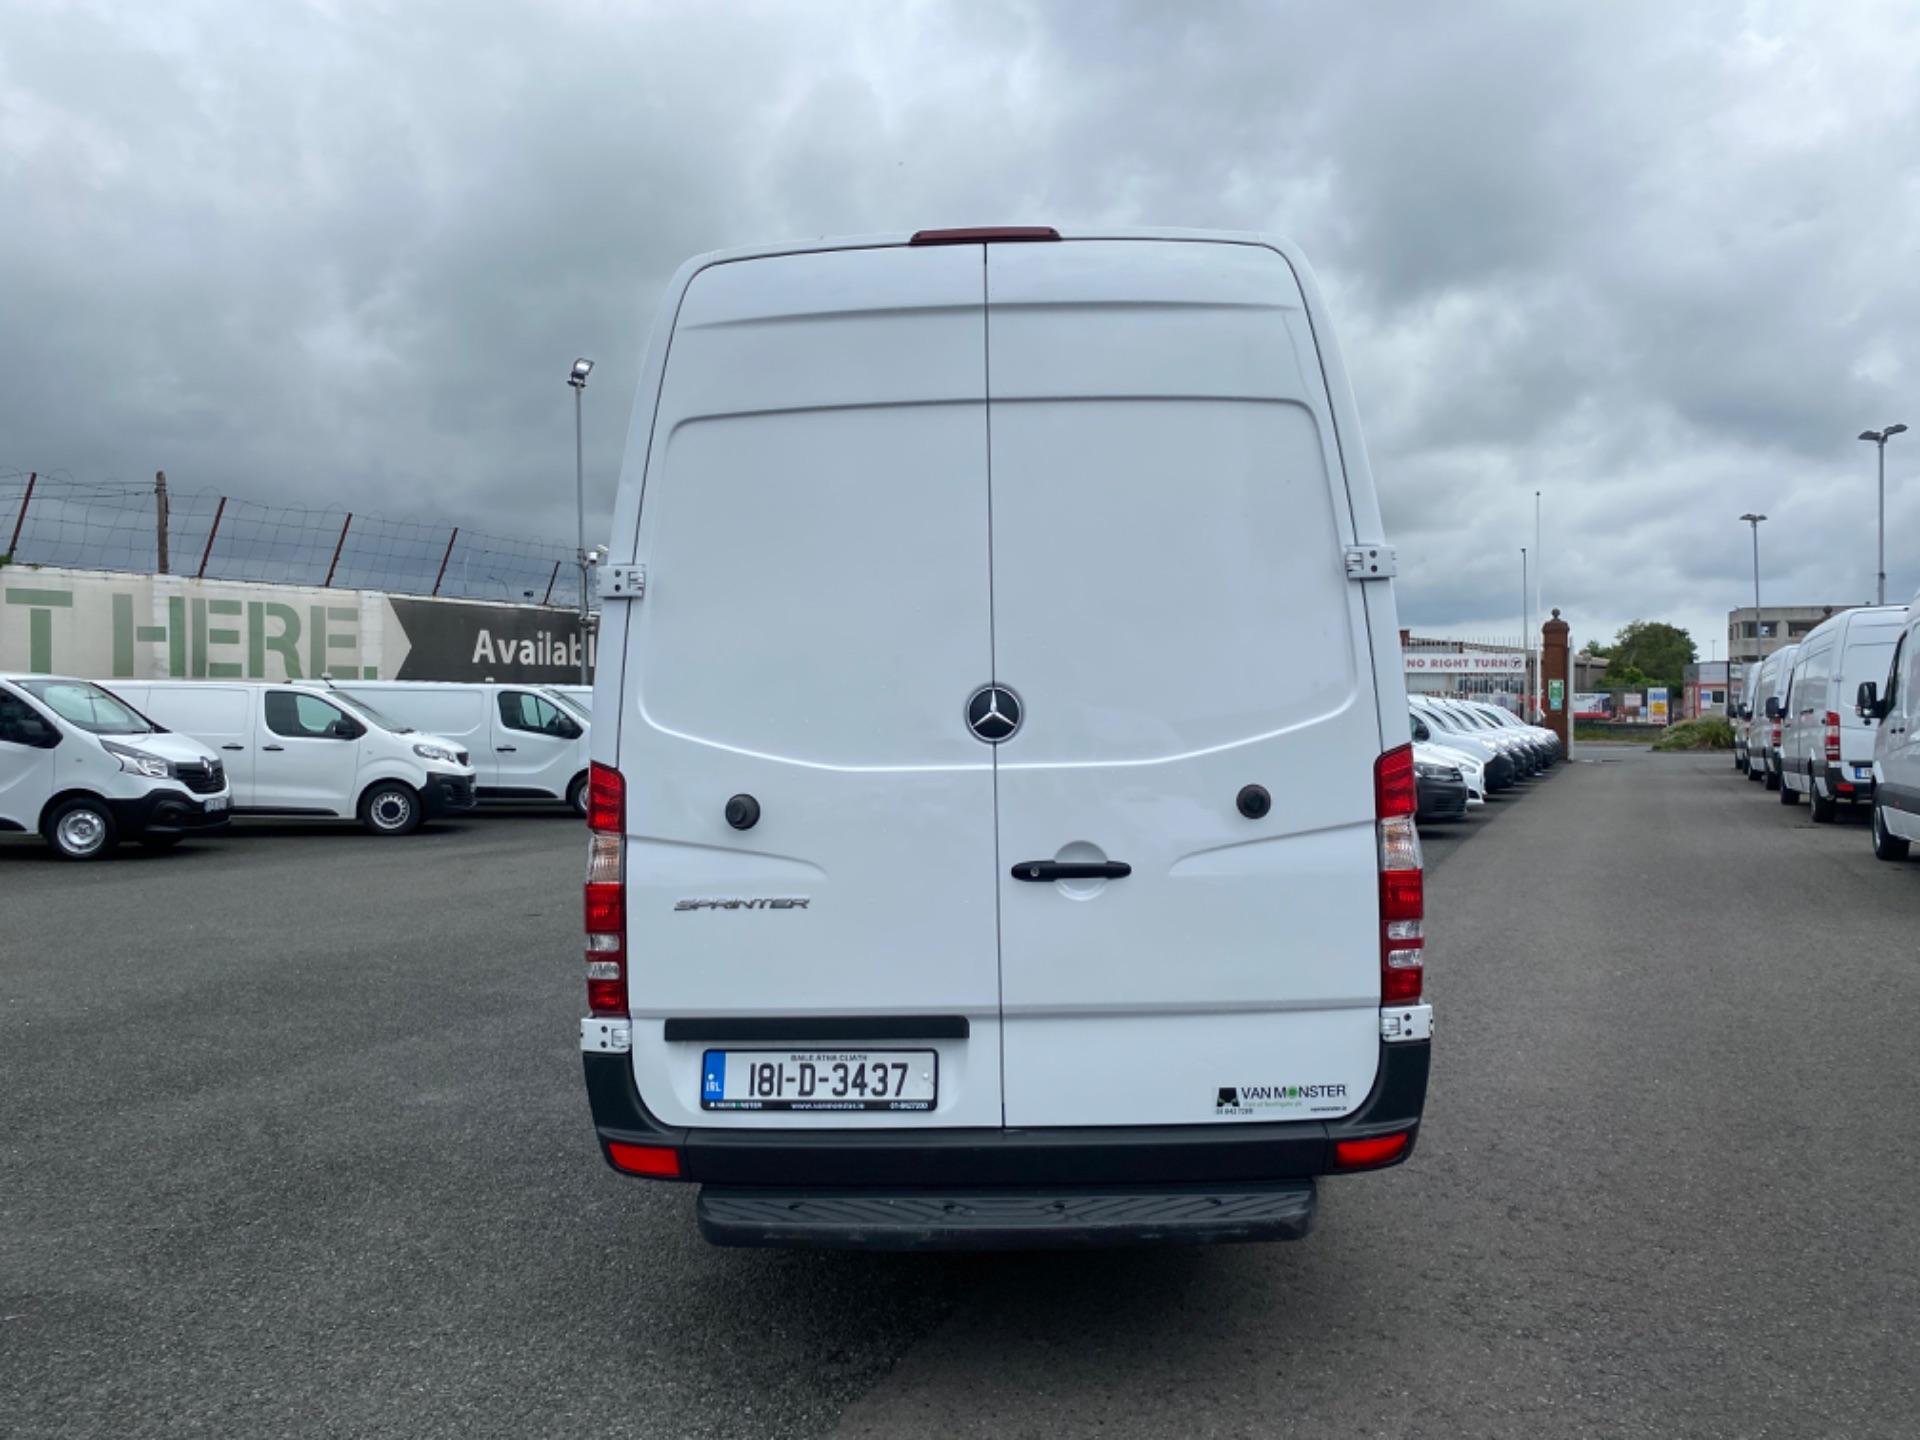 2018 Mercedes-Benz Sprinter 314/43 EU6 6DR (181D3437) Image 6